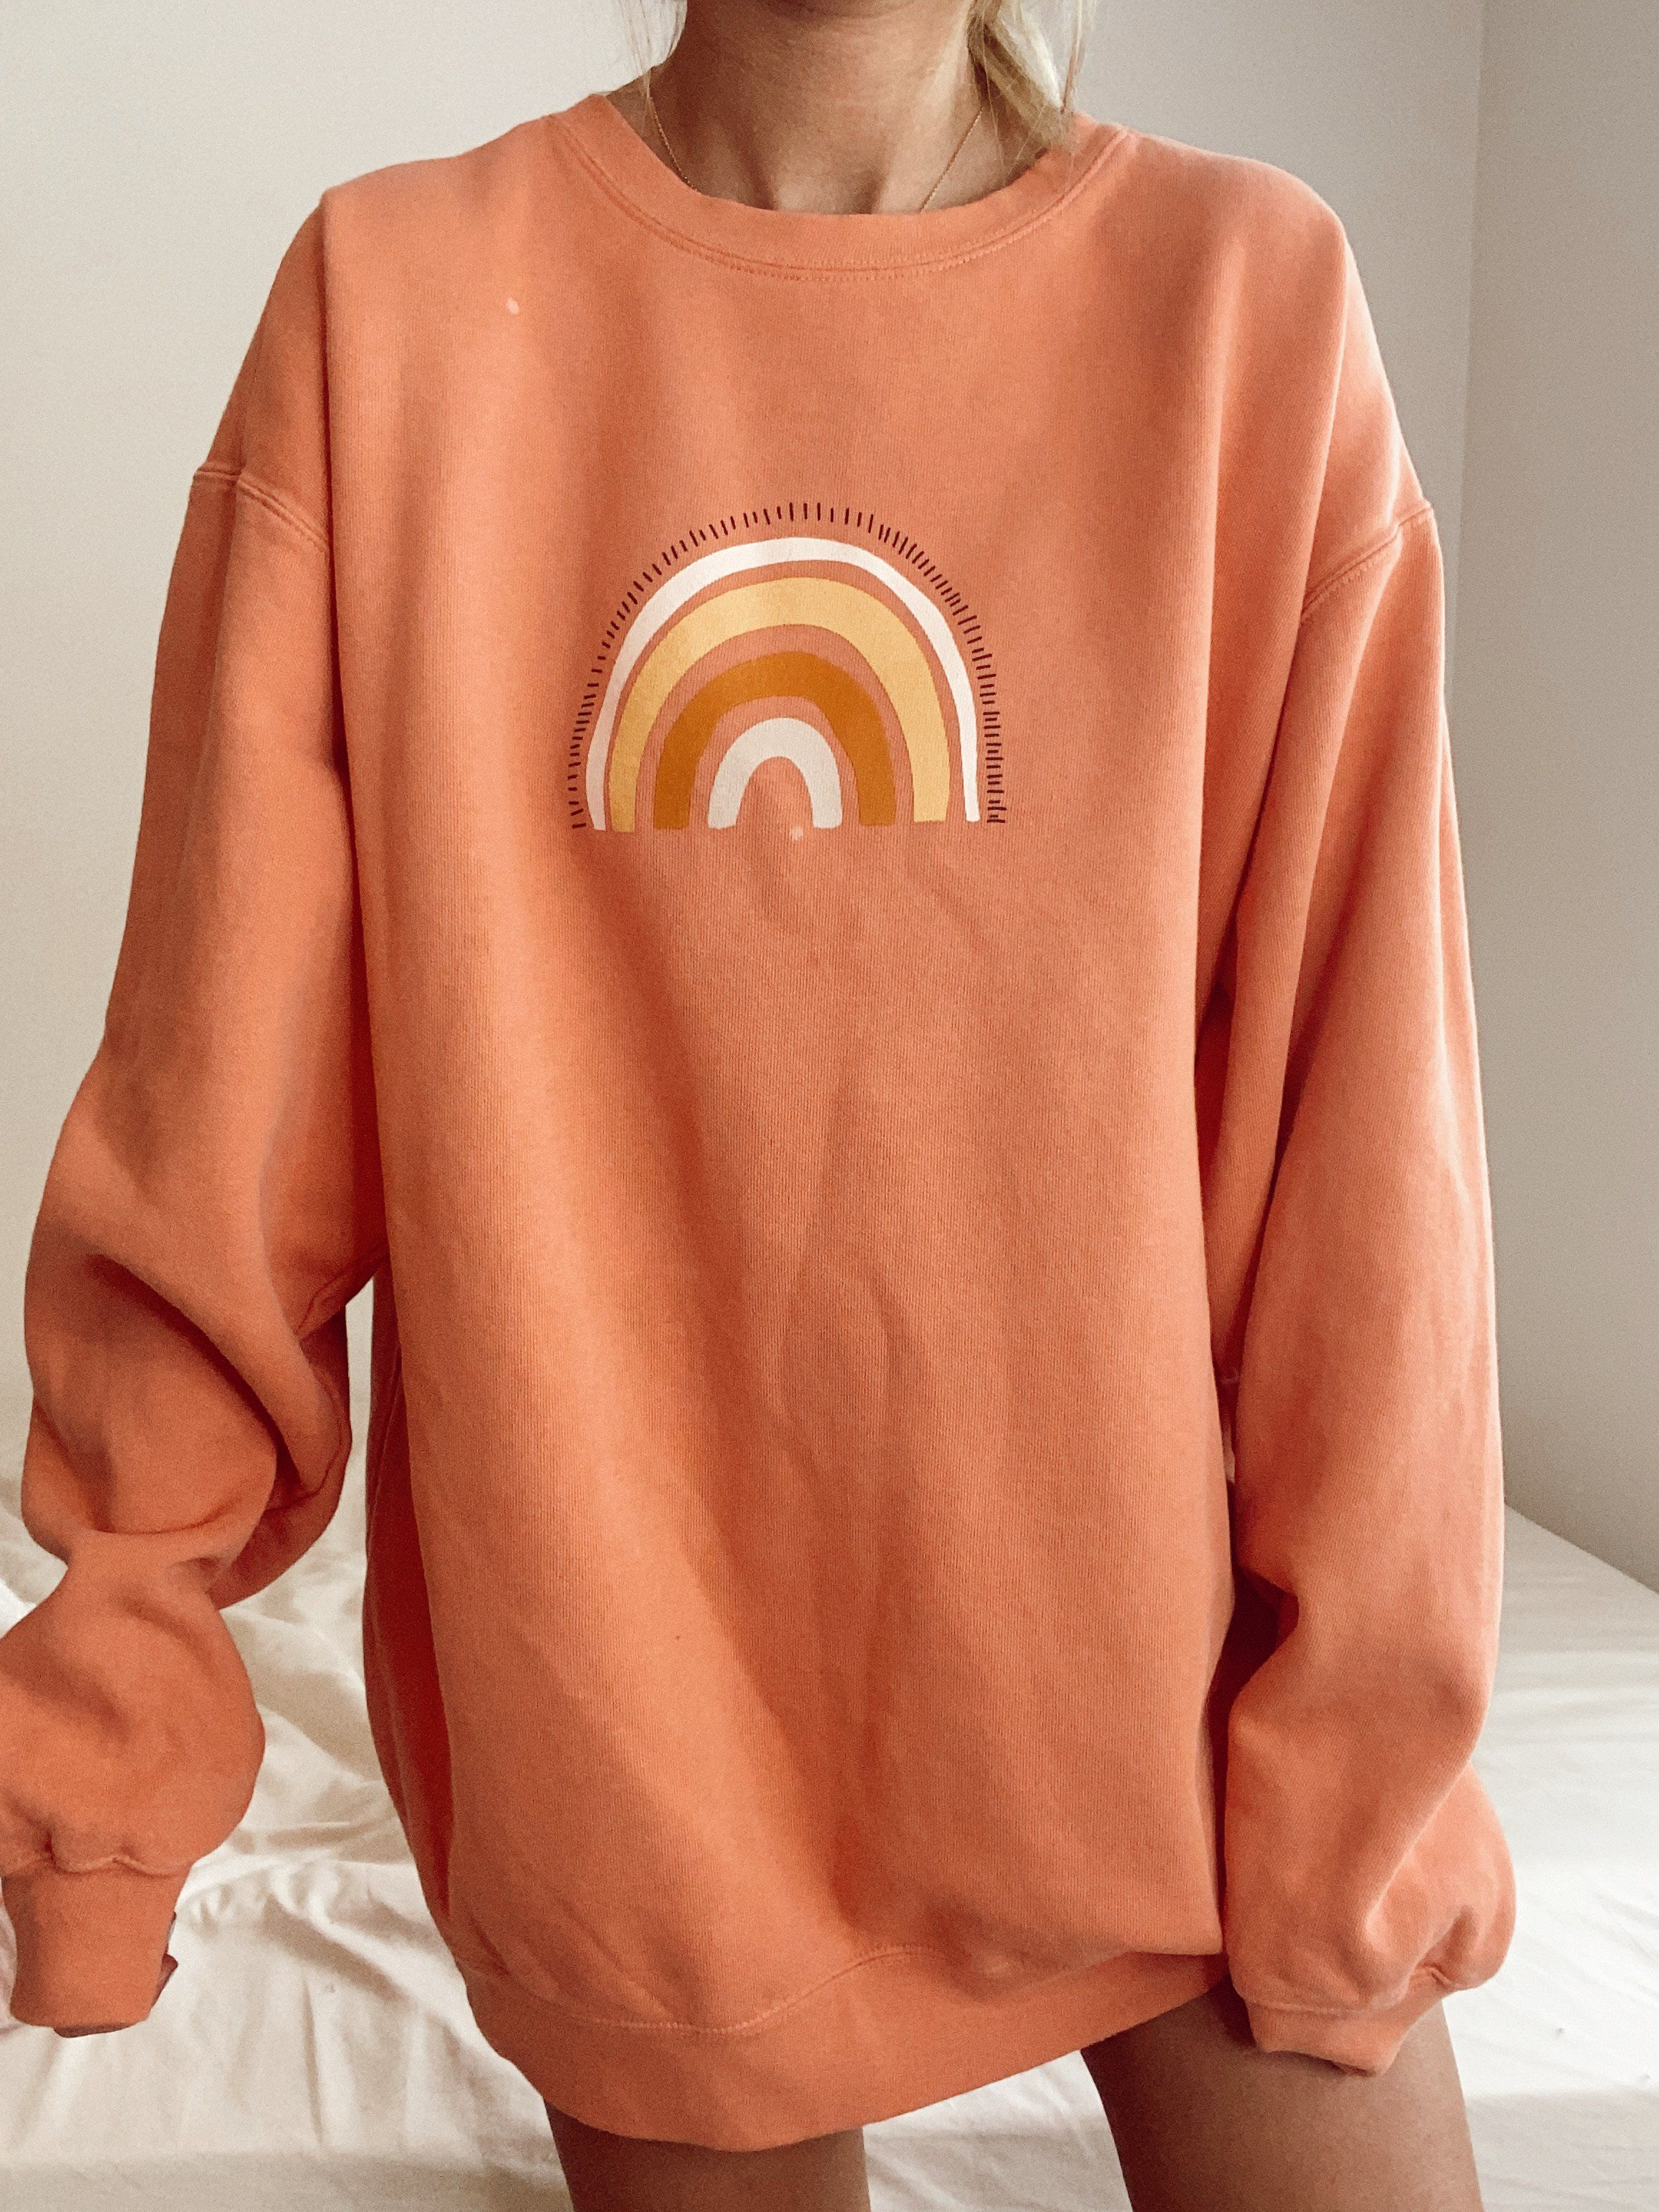 Rainbow Sweatshirt Sunkissedcoconut Sweatshirt Outfit Cozy Sweatshirts Cute Lazy Outfits [ 3088 x 2316 Pixel ]